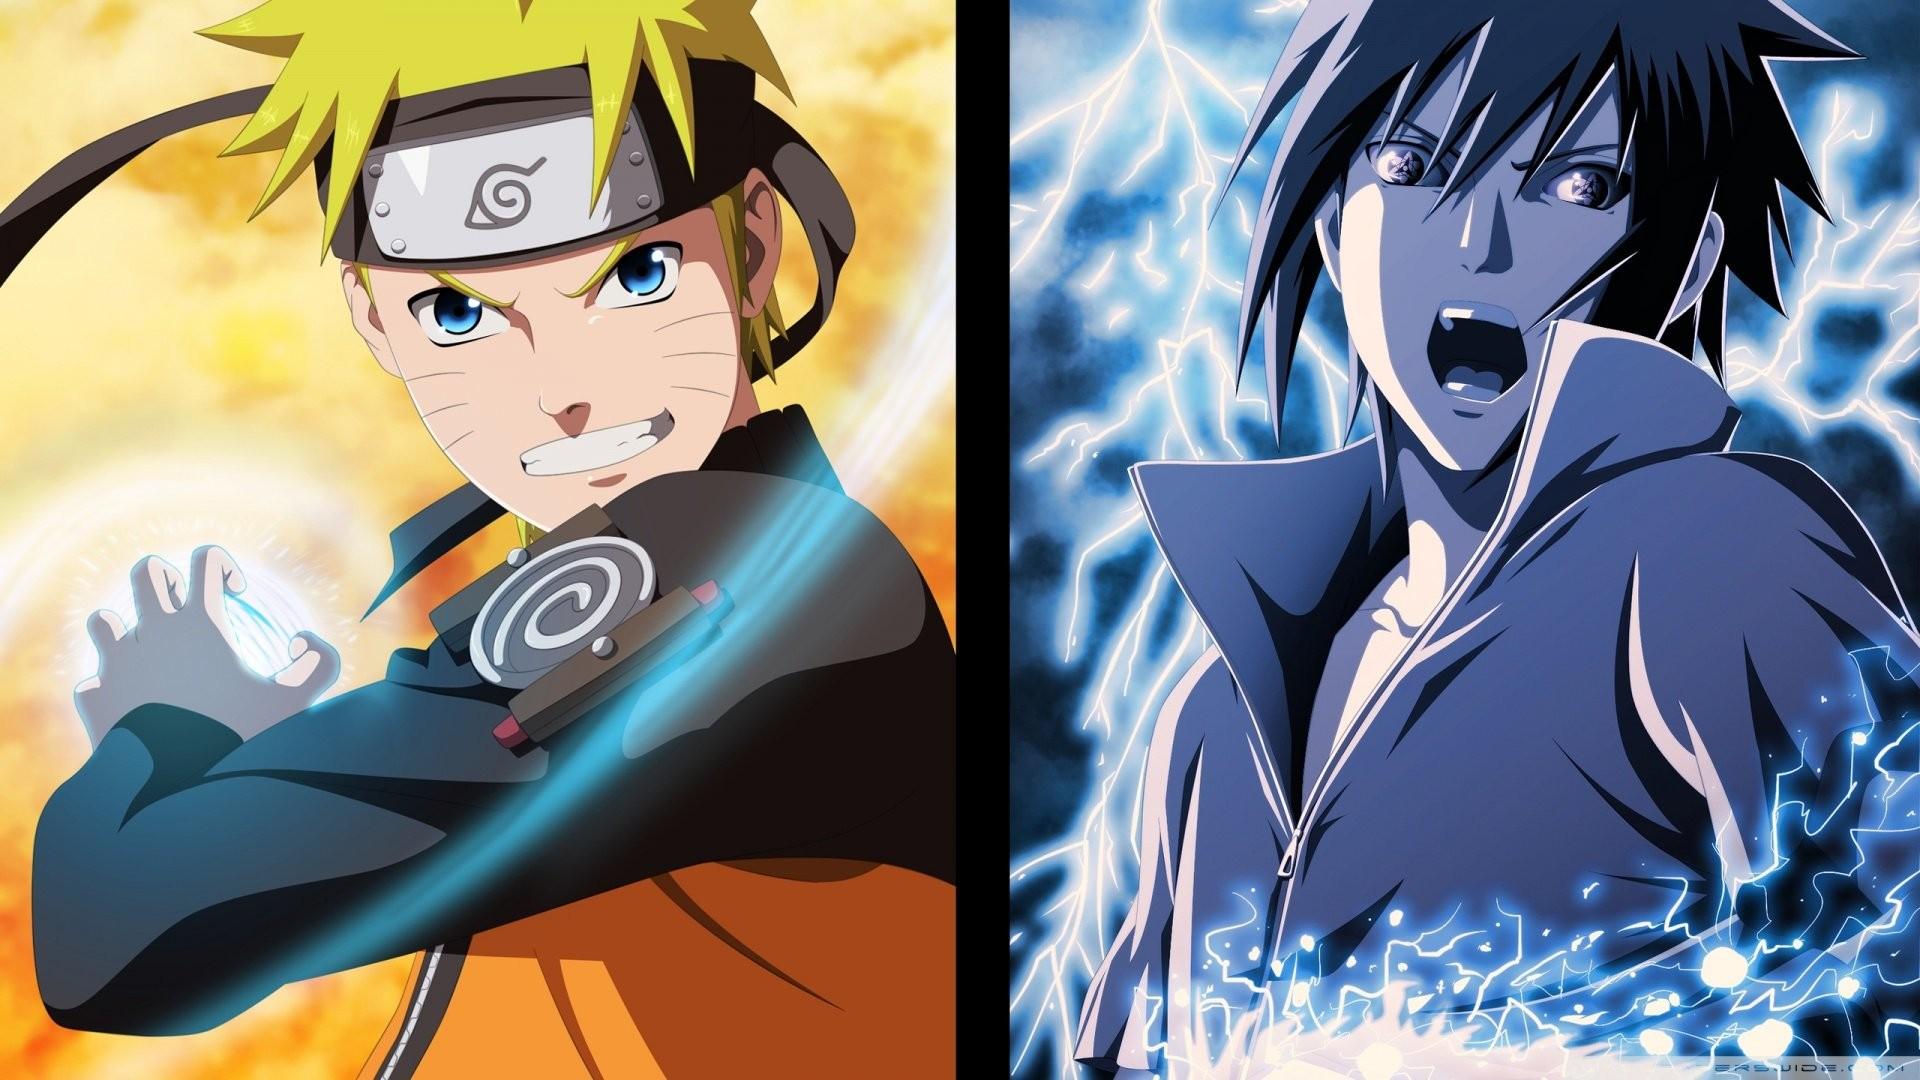 Naruto Vs Sasuke Wallpapers 60 Pictures